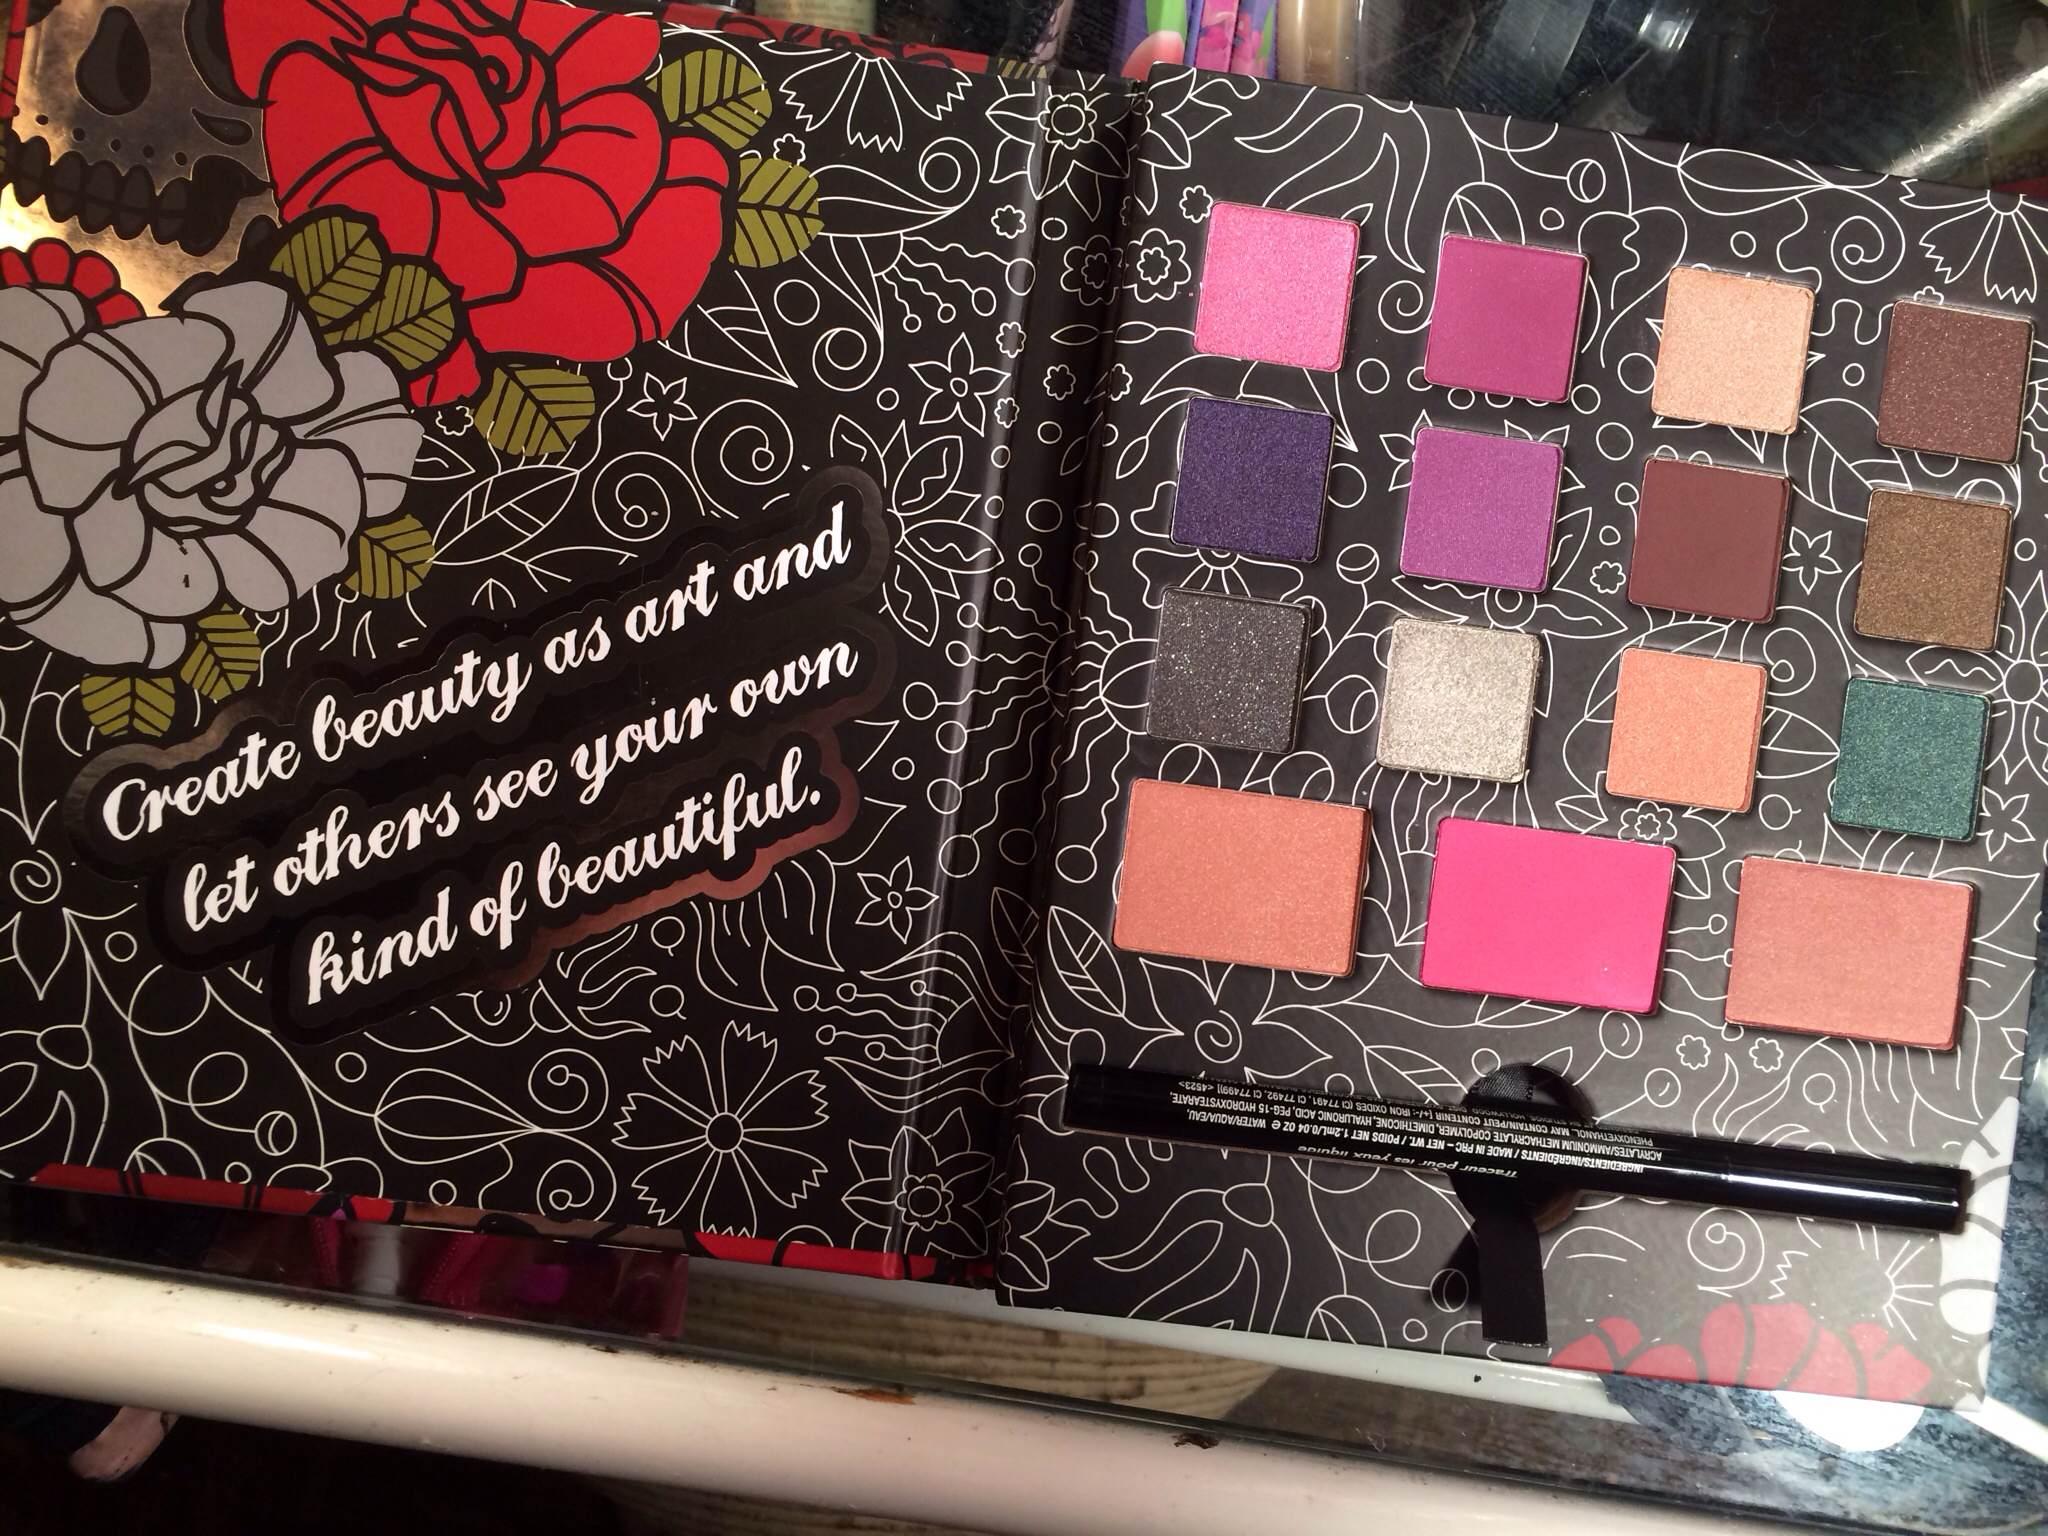 Dark Rose Eyeshadow And Blush Palette by BH Cosmetics #15